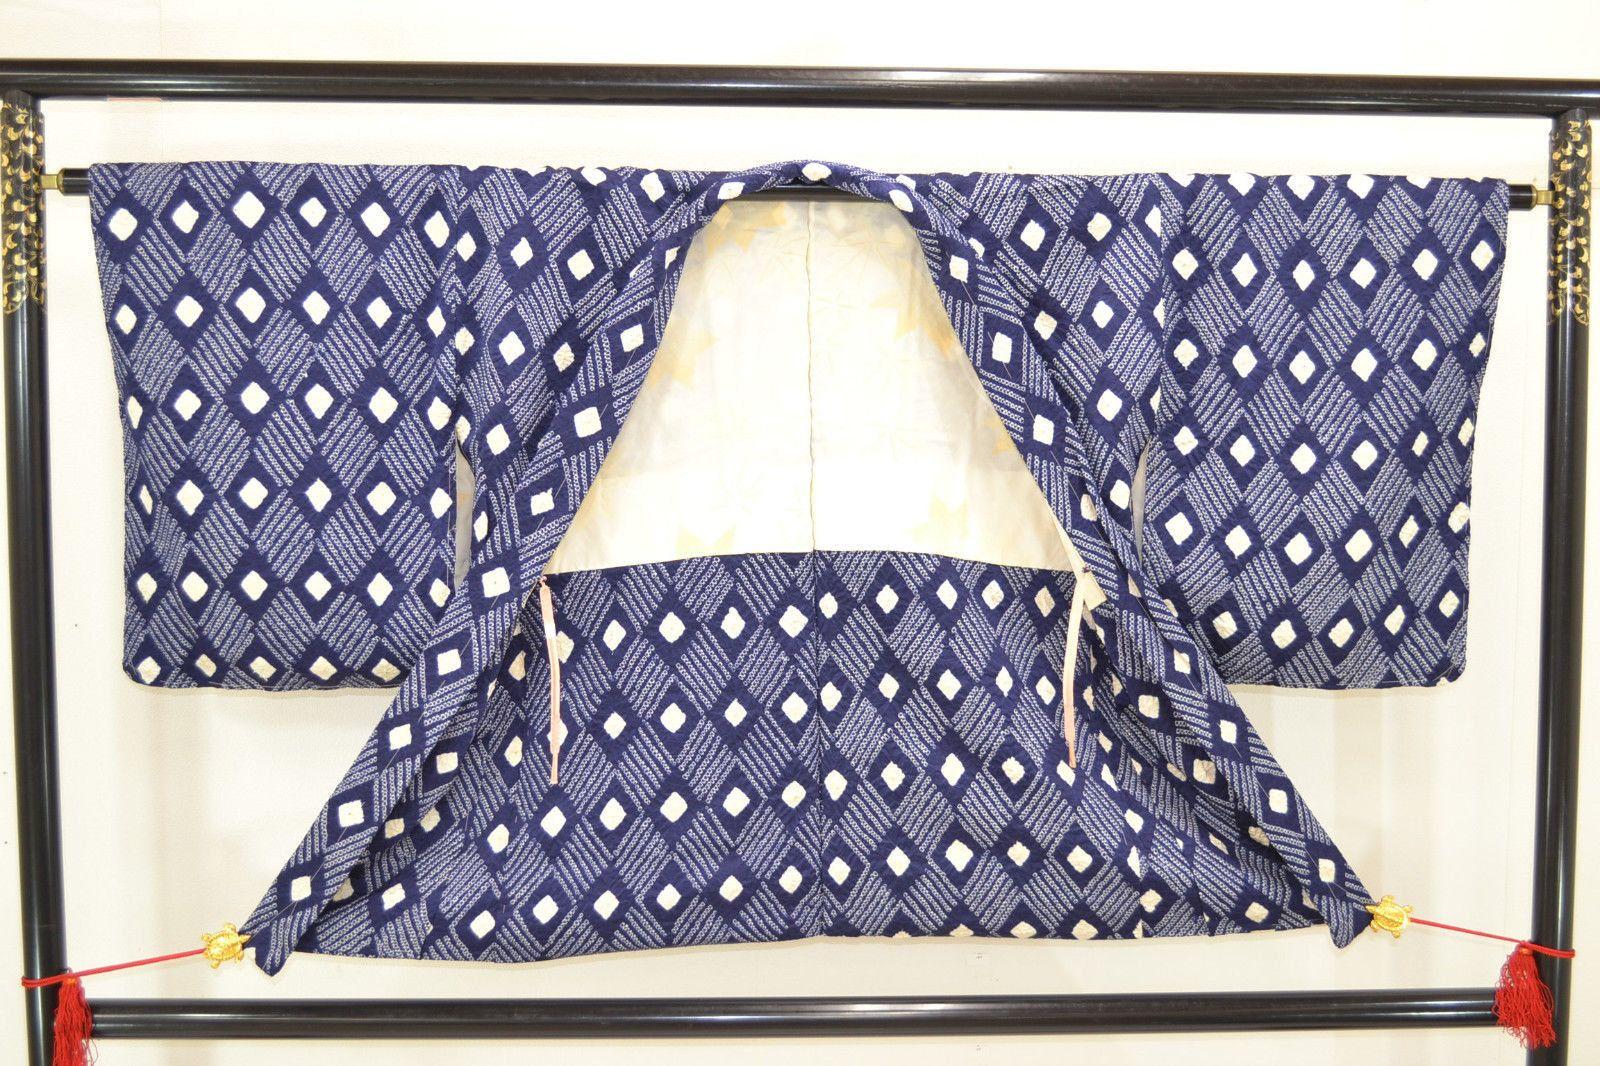 Shibori Diamonds, in Two Techniques, Rich Blue Rinzu Silk Satin: Thread-Resist Haori Kimono Jacket Tie Dye by DianesGemsAndFibers on Etsy